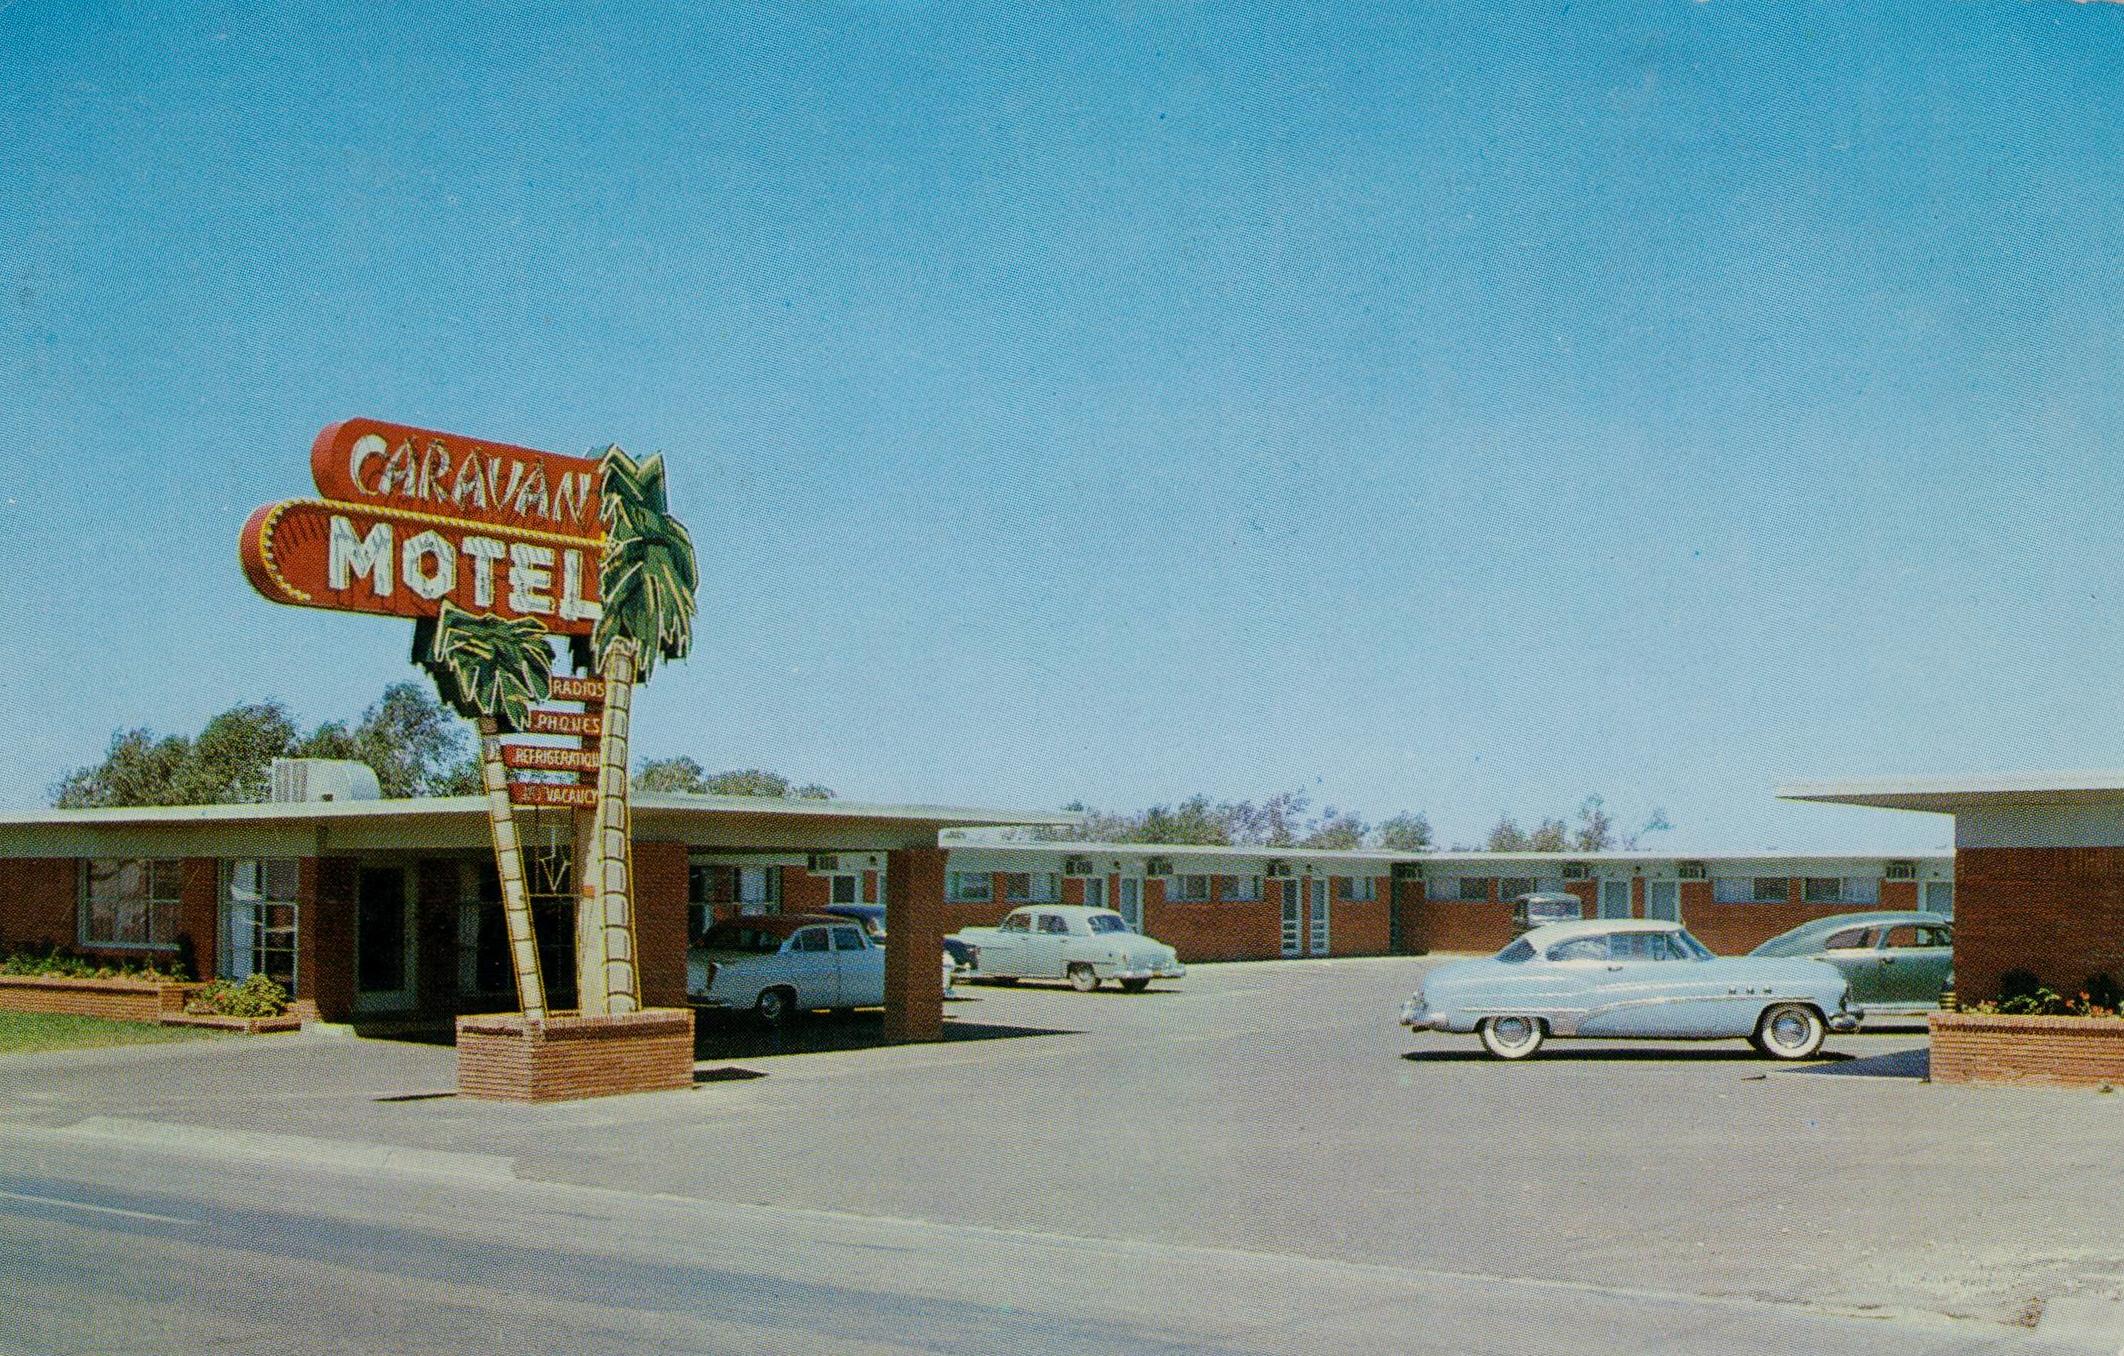 Caravan Motel - 620 West Amarillo Boulevard, Amarillo, Texas U.S.A. - 1950's